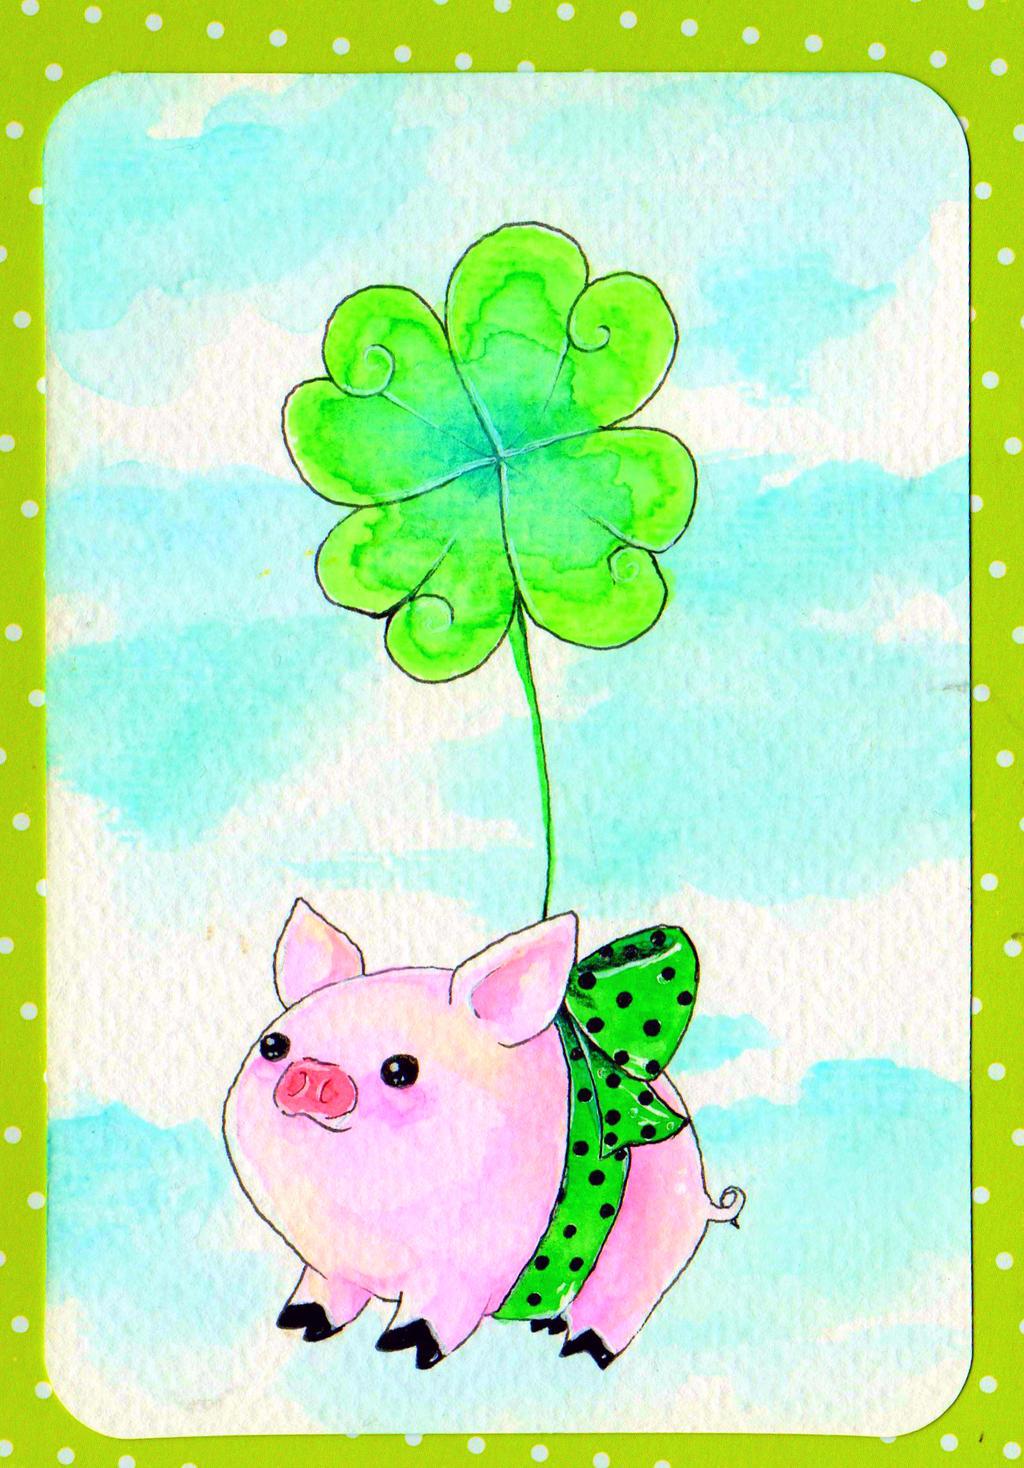 Piggy in Green by NanakoHarrison